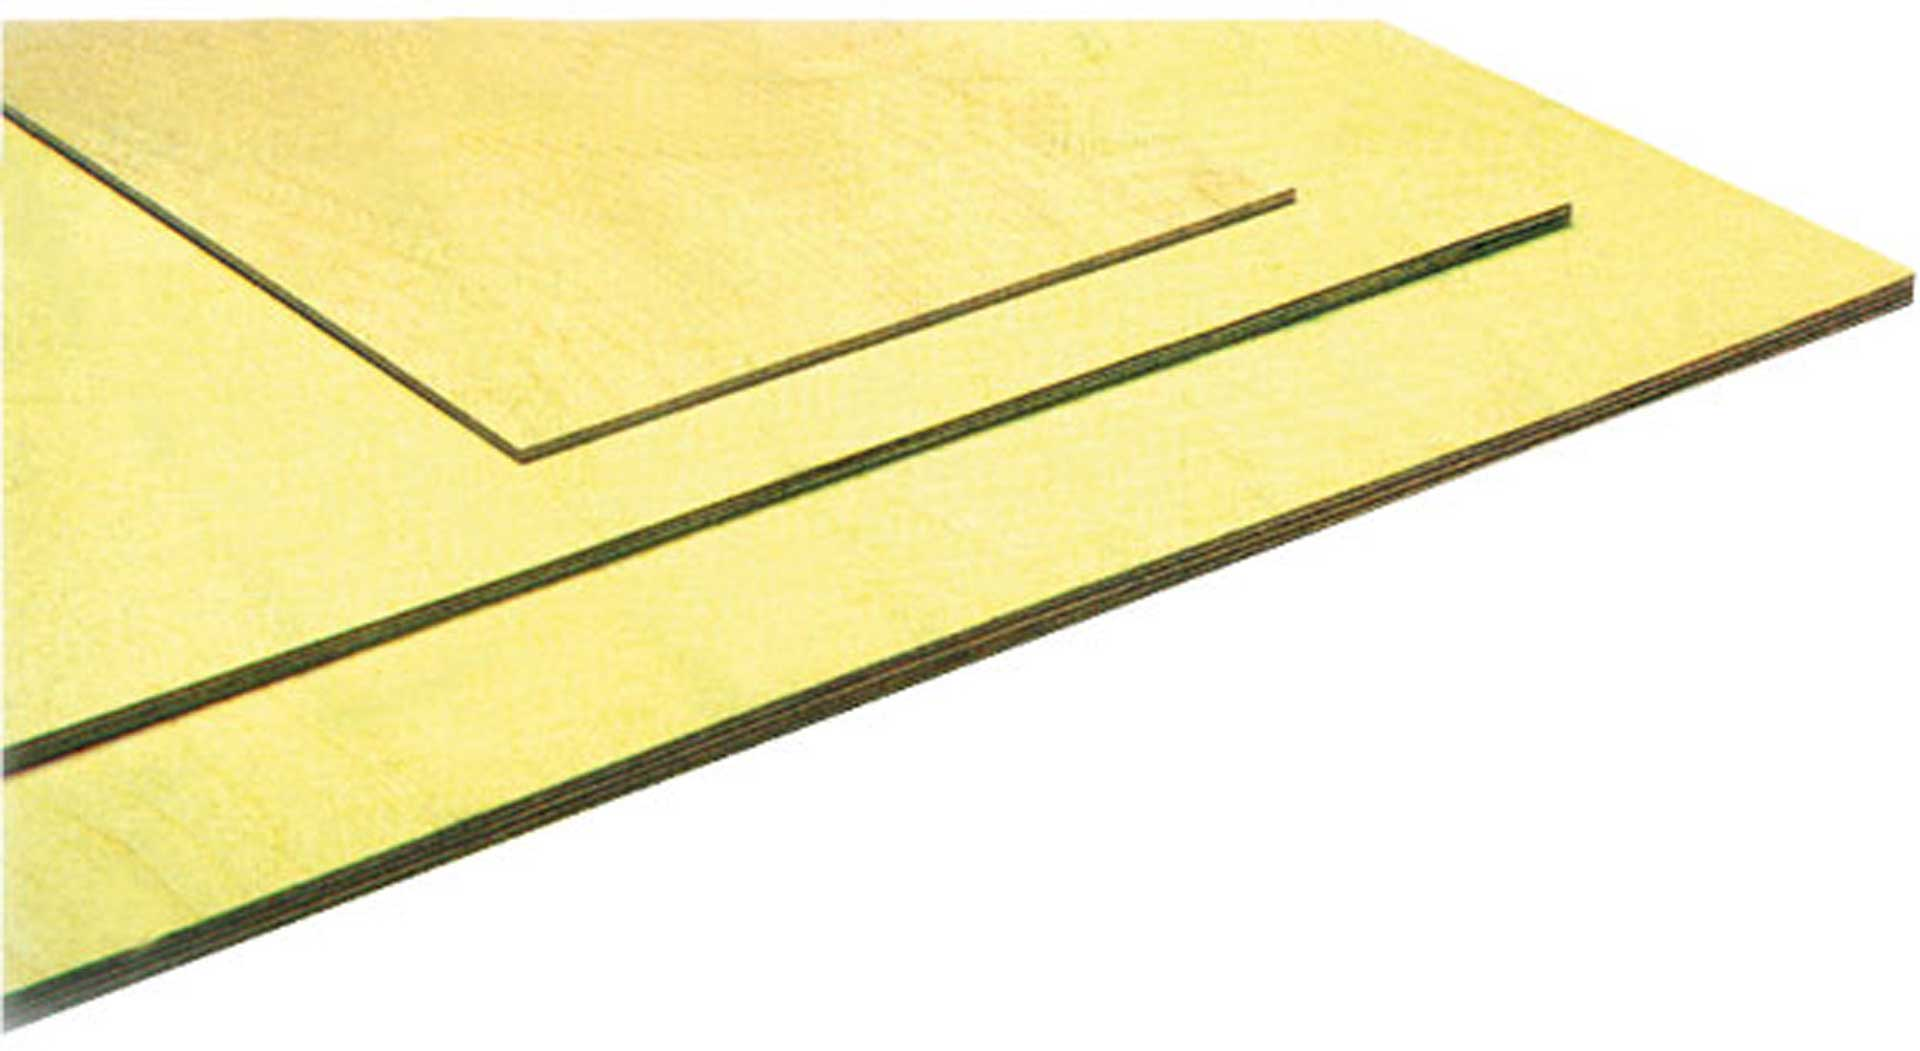 MODELLBAU LINDINGER BIRCH-SPERRY 2,5/300/1000MM